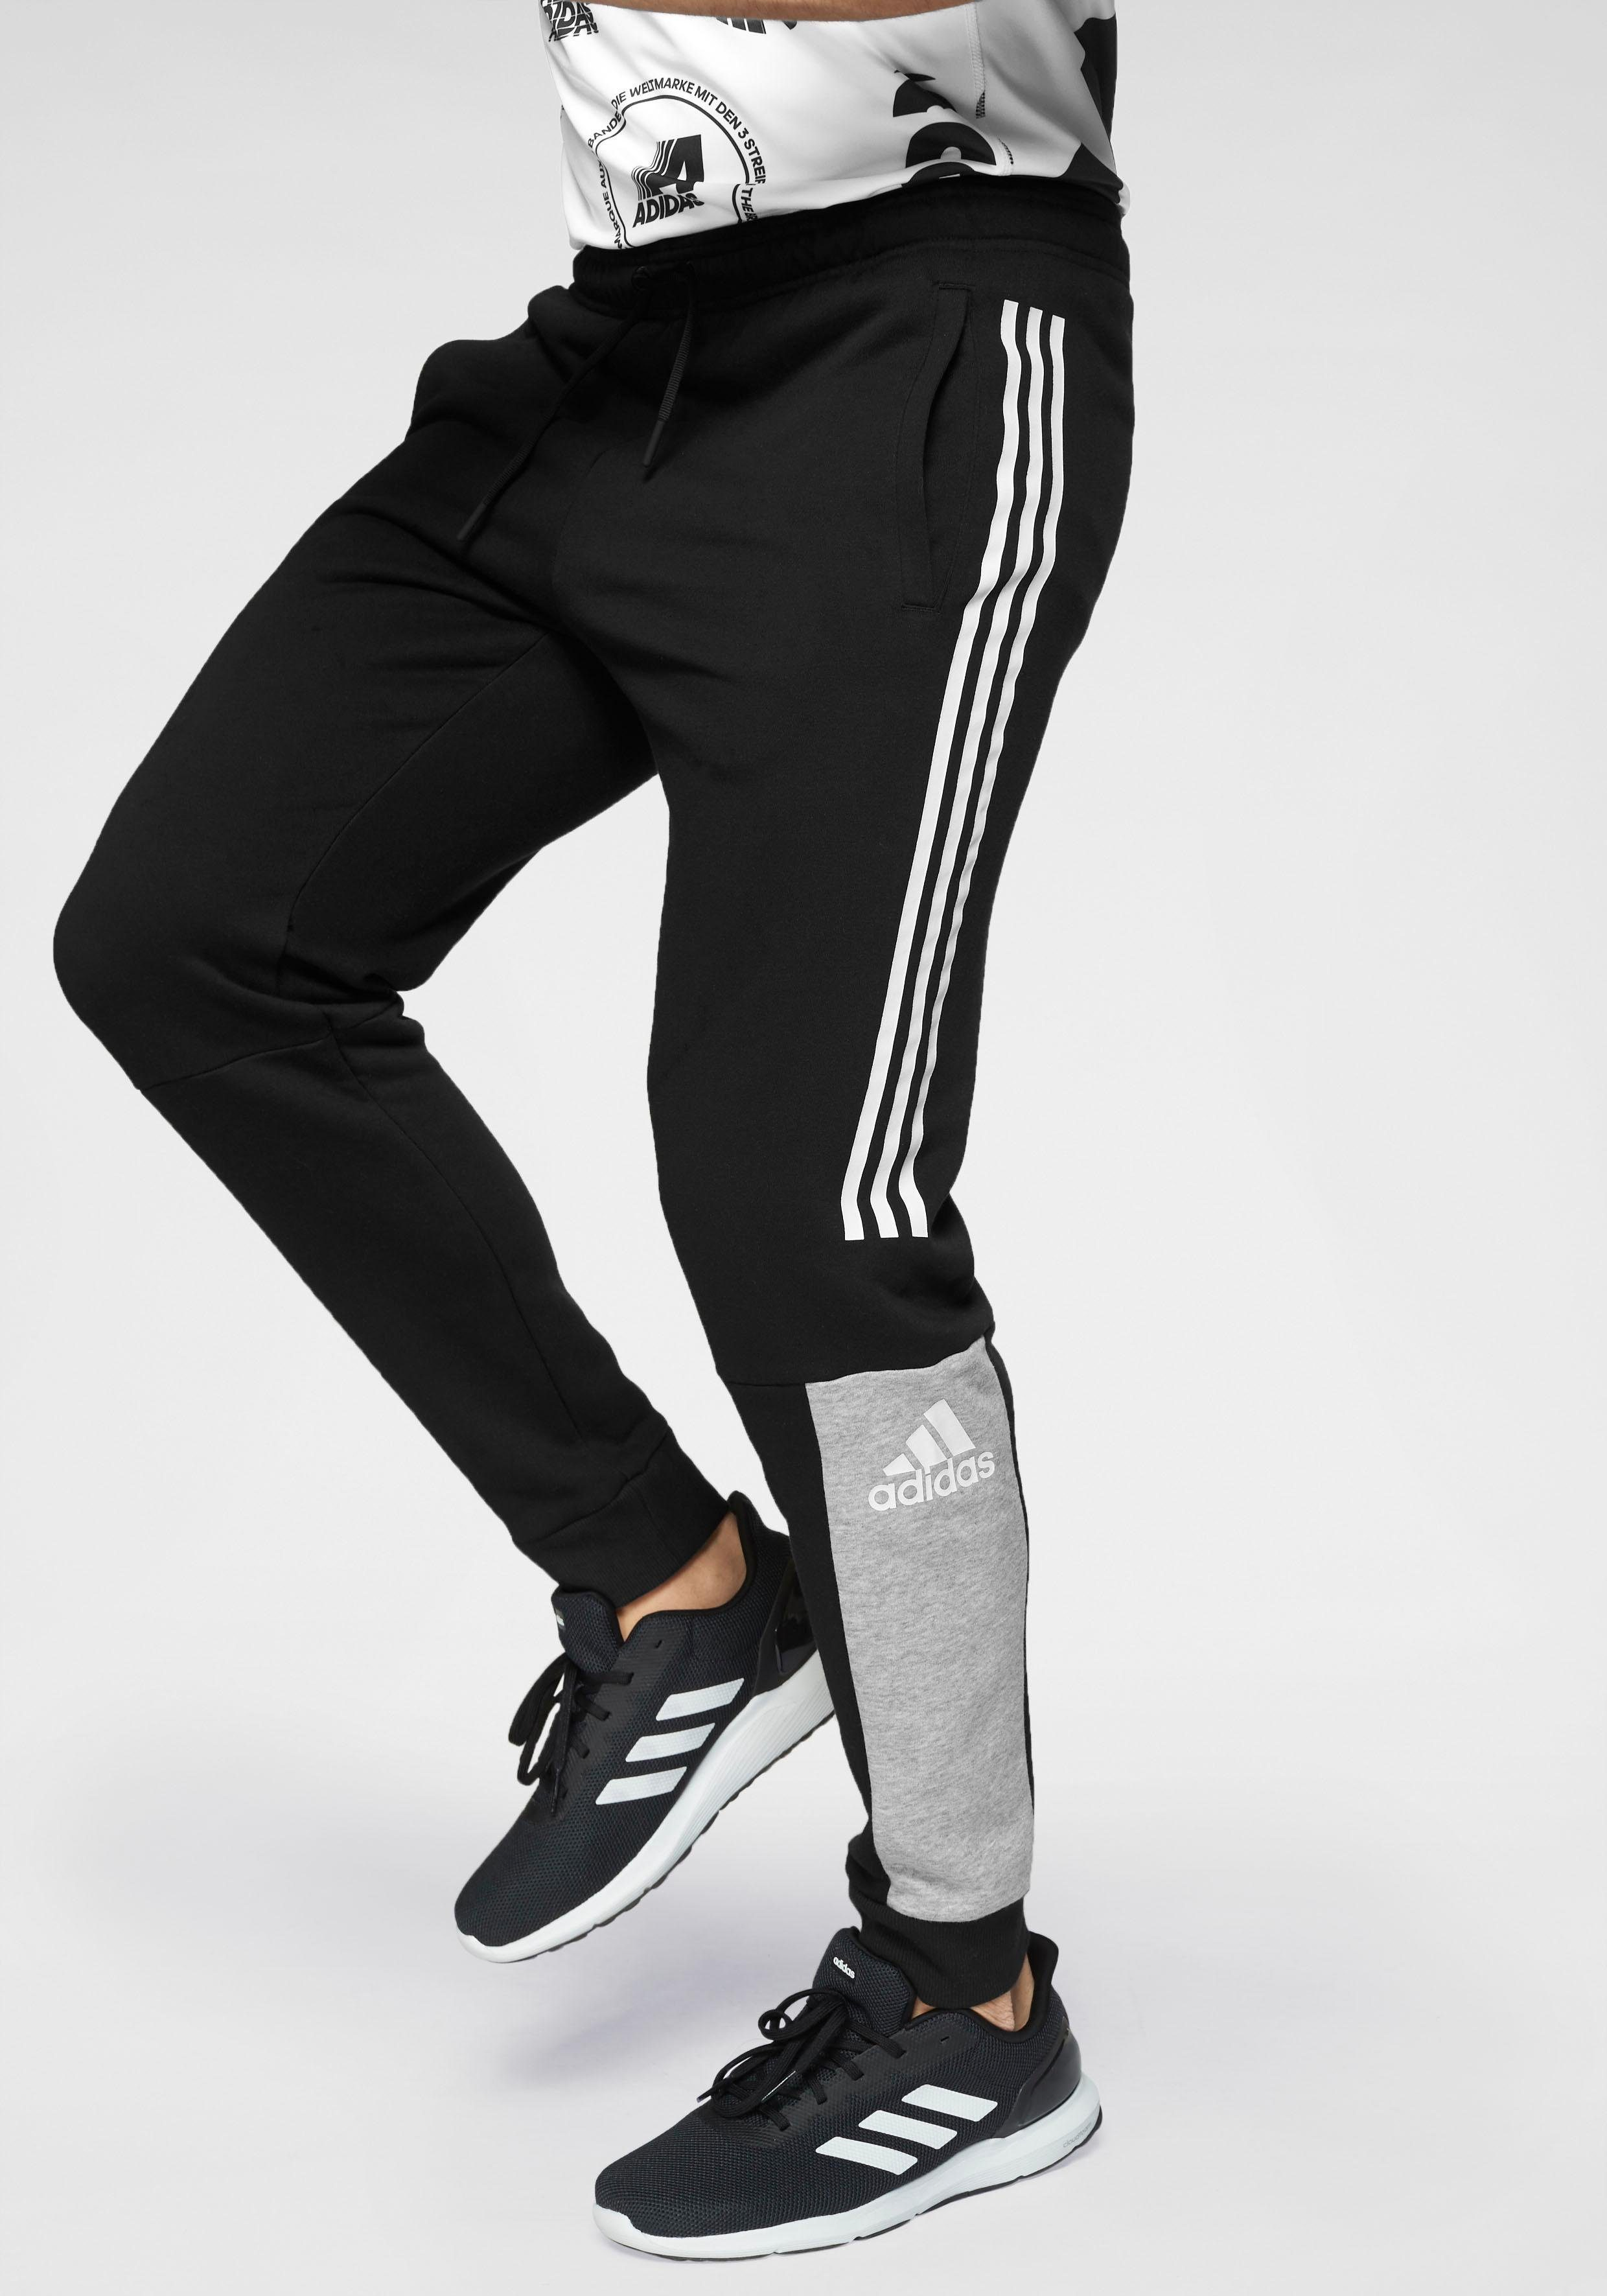 adidas Performance Jogginghose online kaufen | OTTO